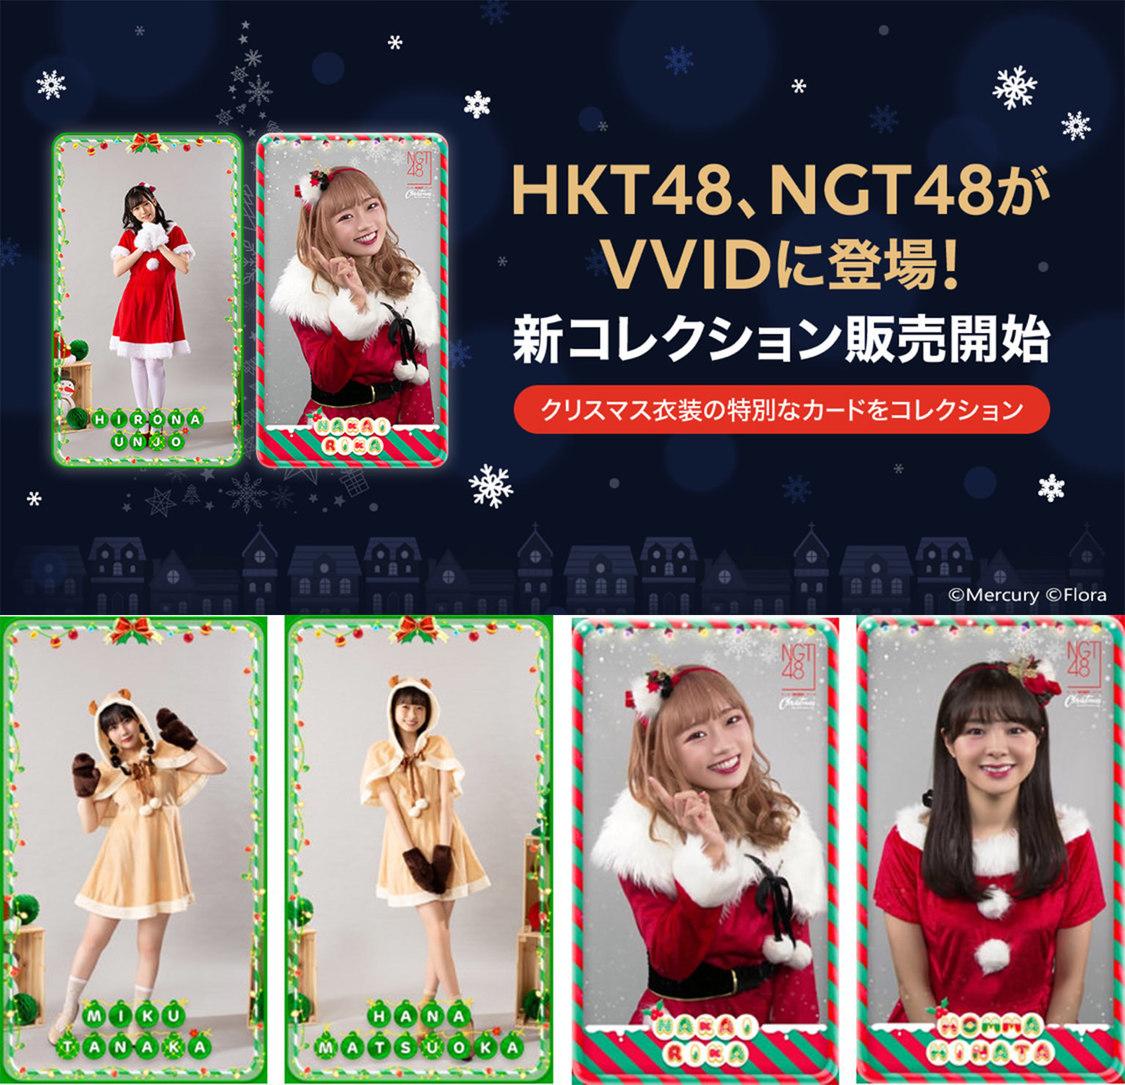 HKT48、NGT48、サンタ&トナカイ姿の未公開写真・映像が楽しめるデジタルカード販売開始!